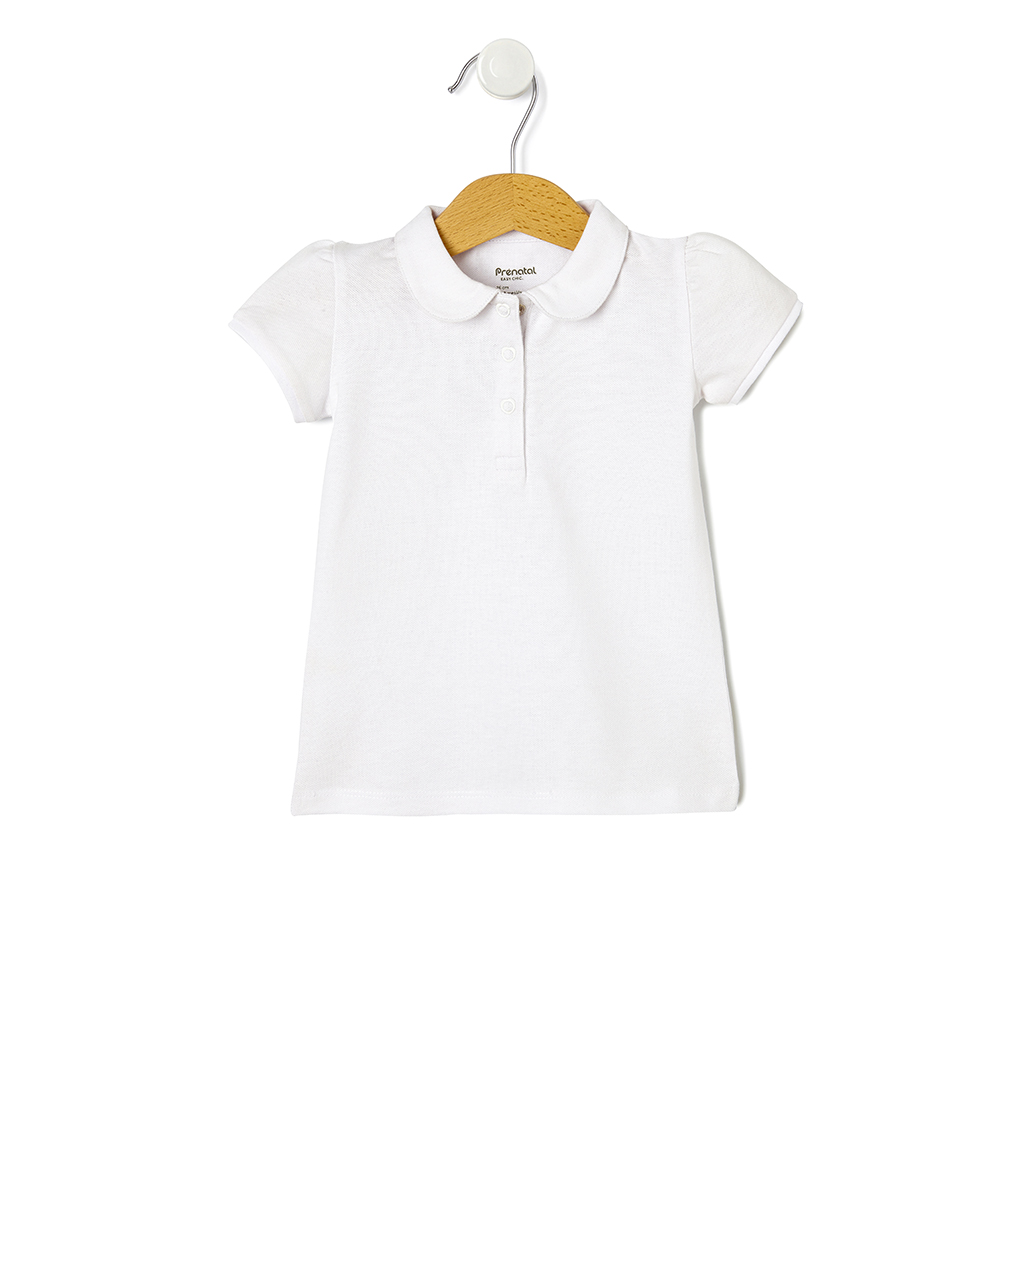 T-Shirt Πόλο Πικέ Λευκό για Κορίτσι